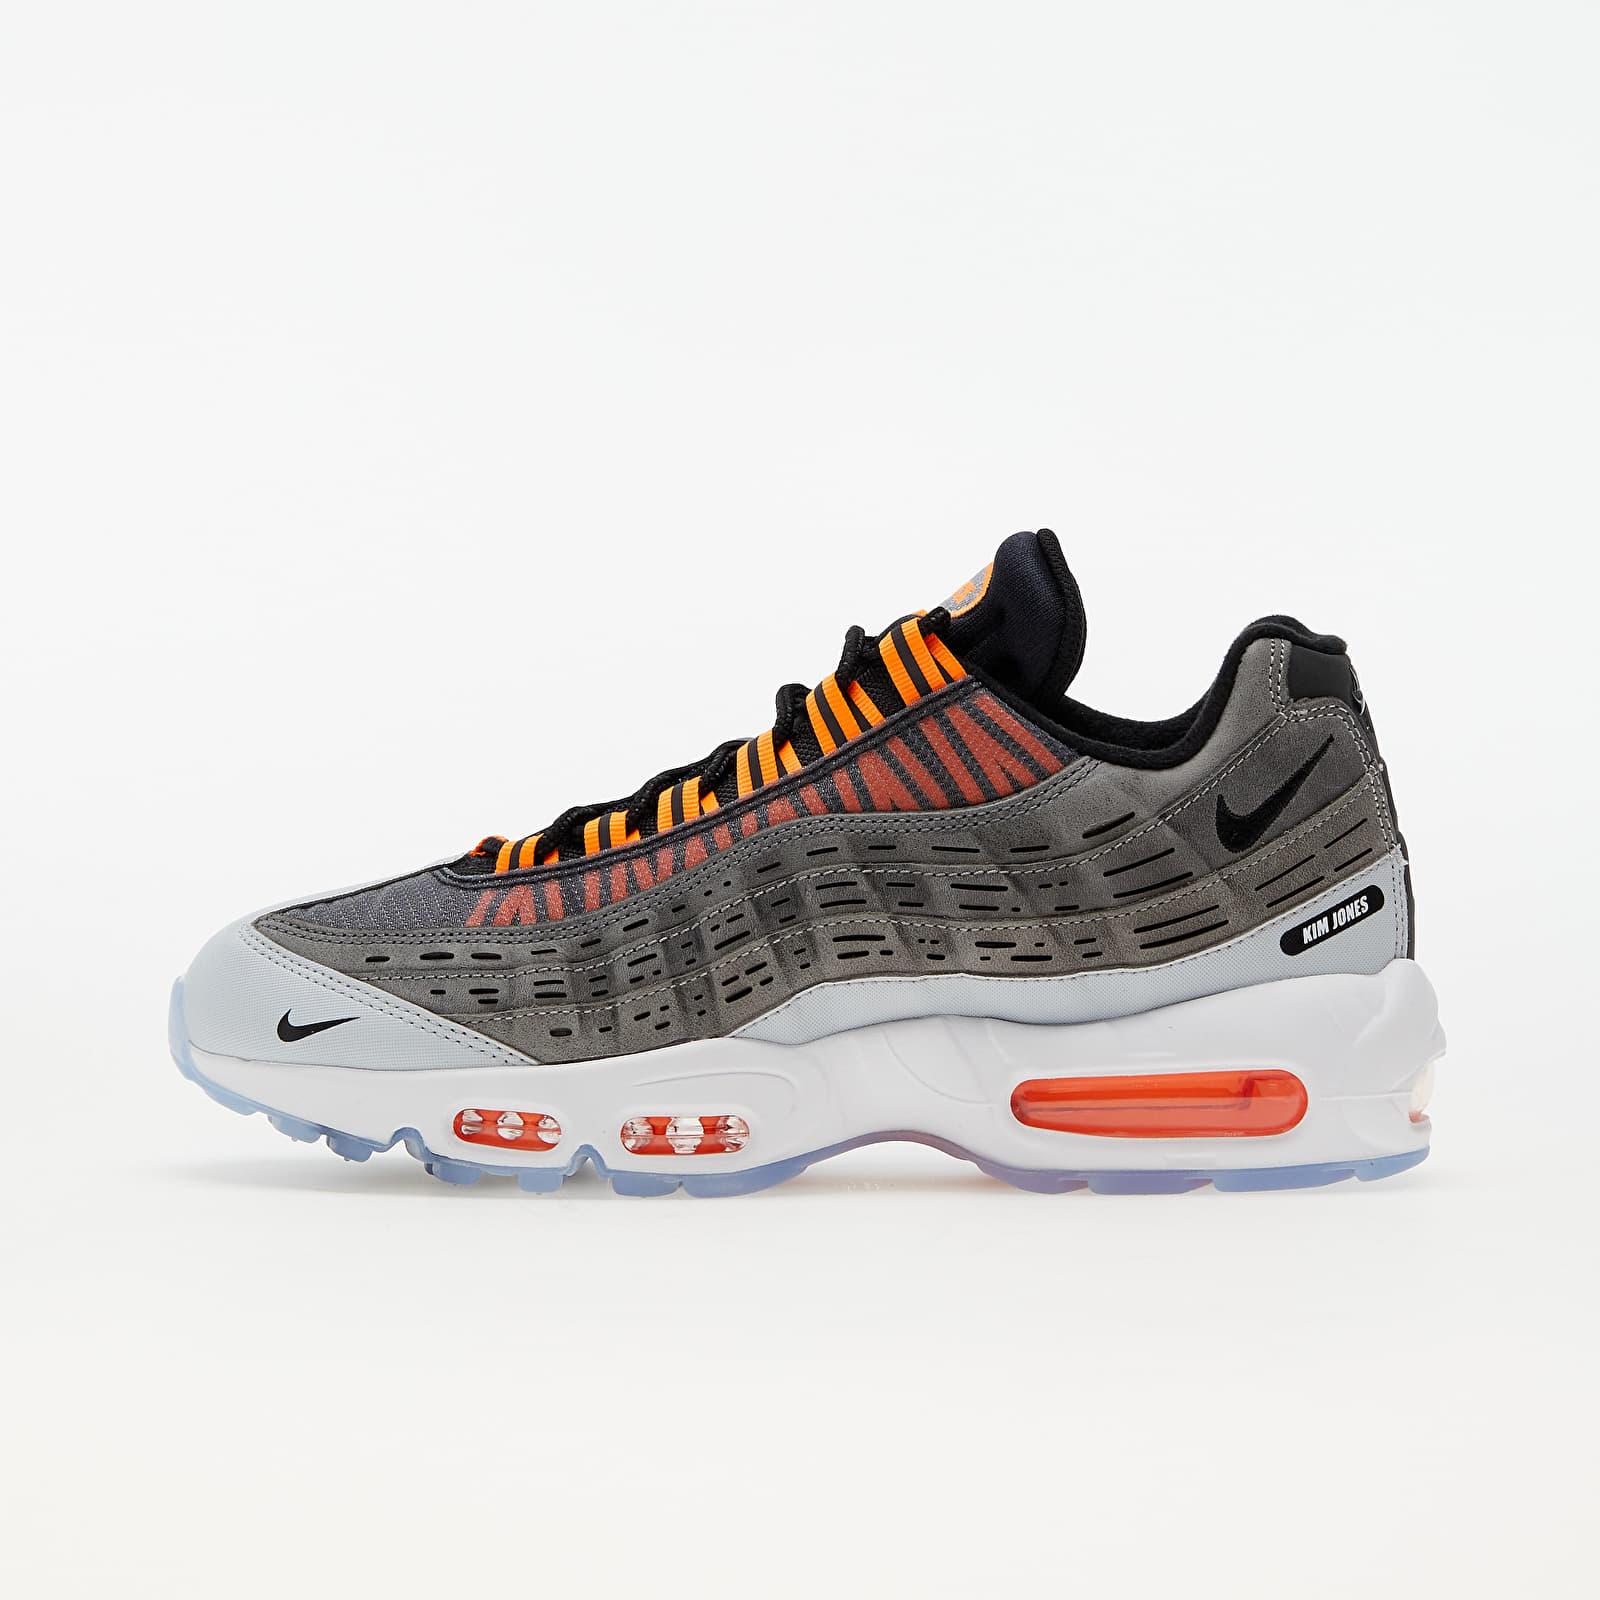 Nike x Kim Jones Air Max 95 Black/ Total Orange-Dark Grey-Cool Grey DD1871-001